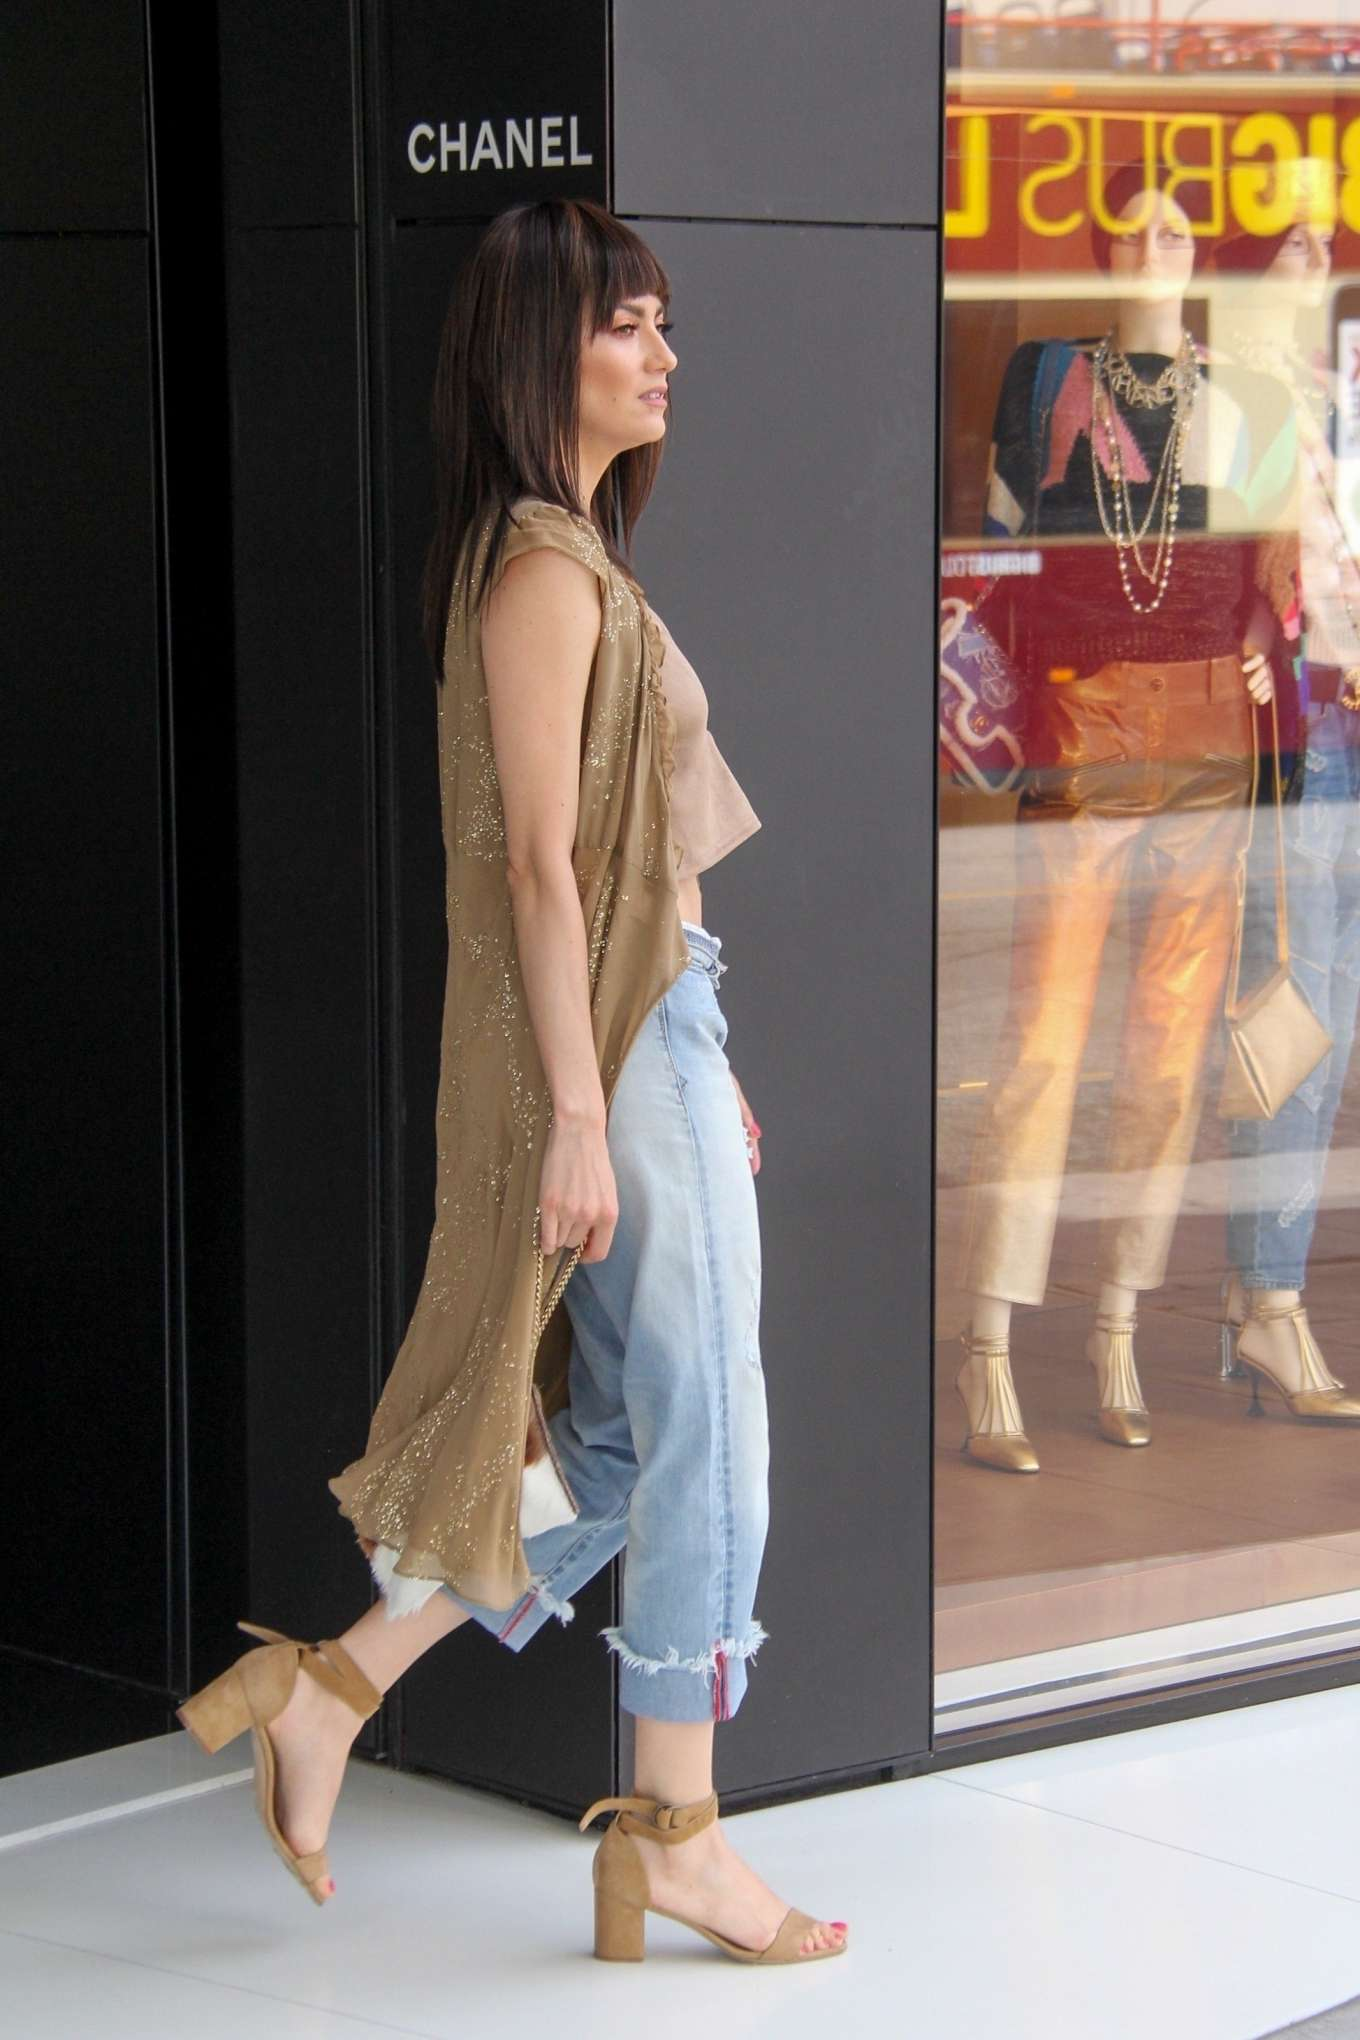 Blanca Blanco 2019 : Blanca Blanco: Shopping at Chanel on Robertson Blvd-04